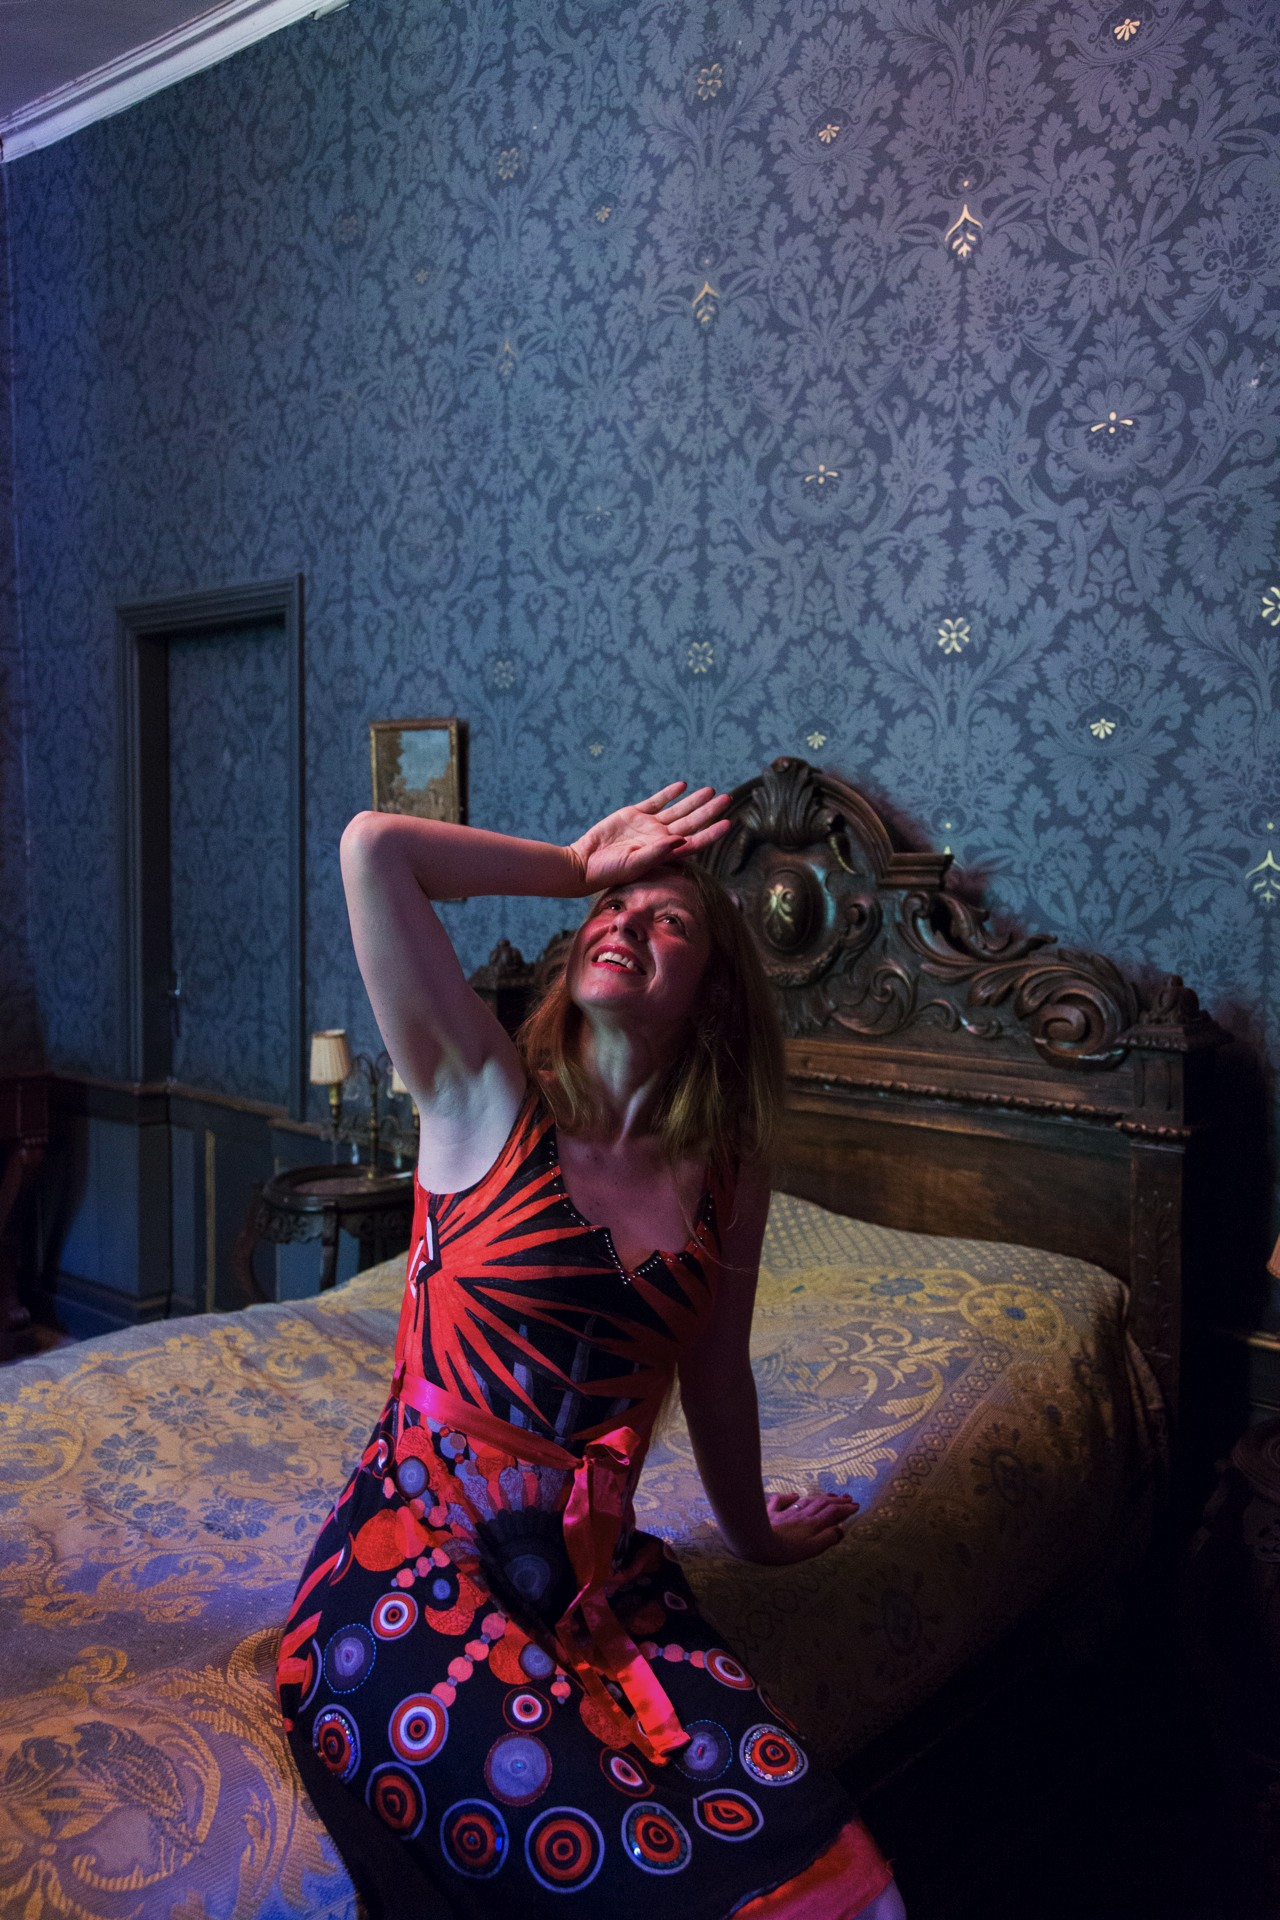 Dans la chambre de Mme Bovary